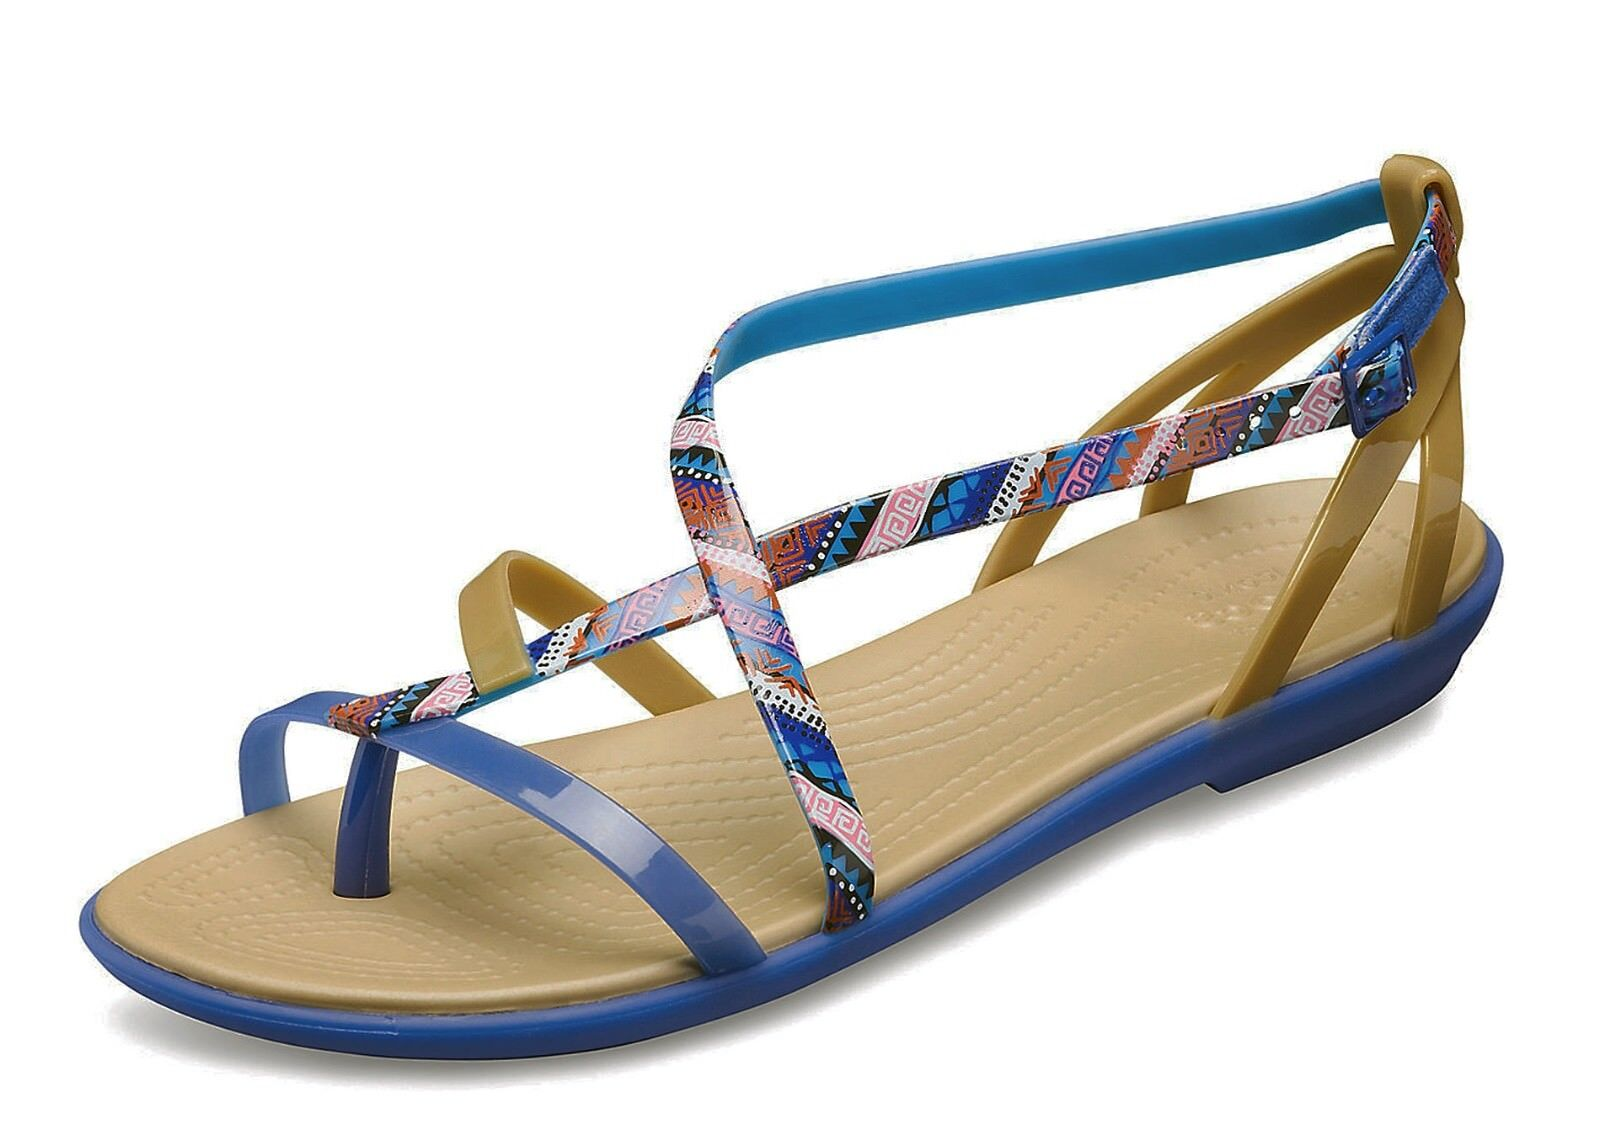 Crocs NEW Isabella sandals Gladiator Graphic blue jean comfort strappy sandals Isabella UK 3-9 309133